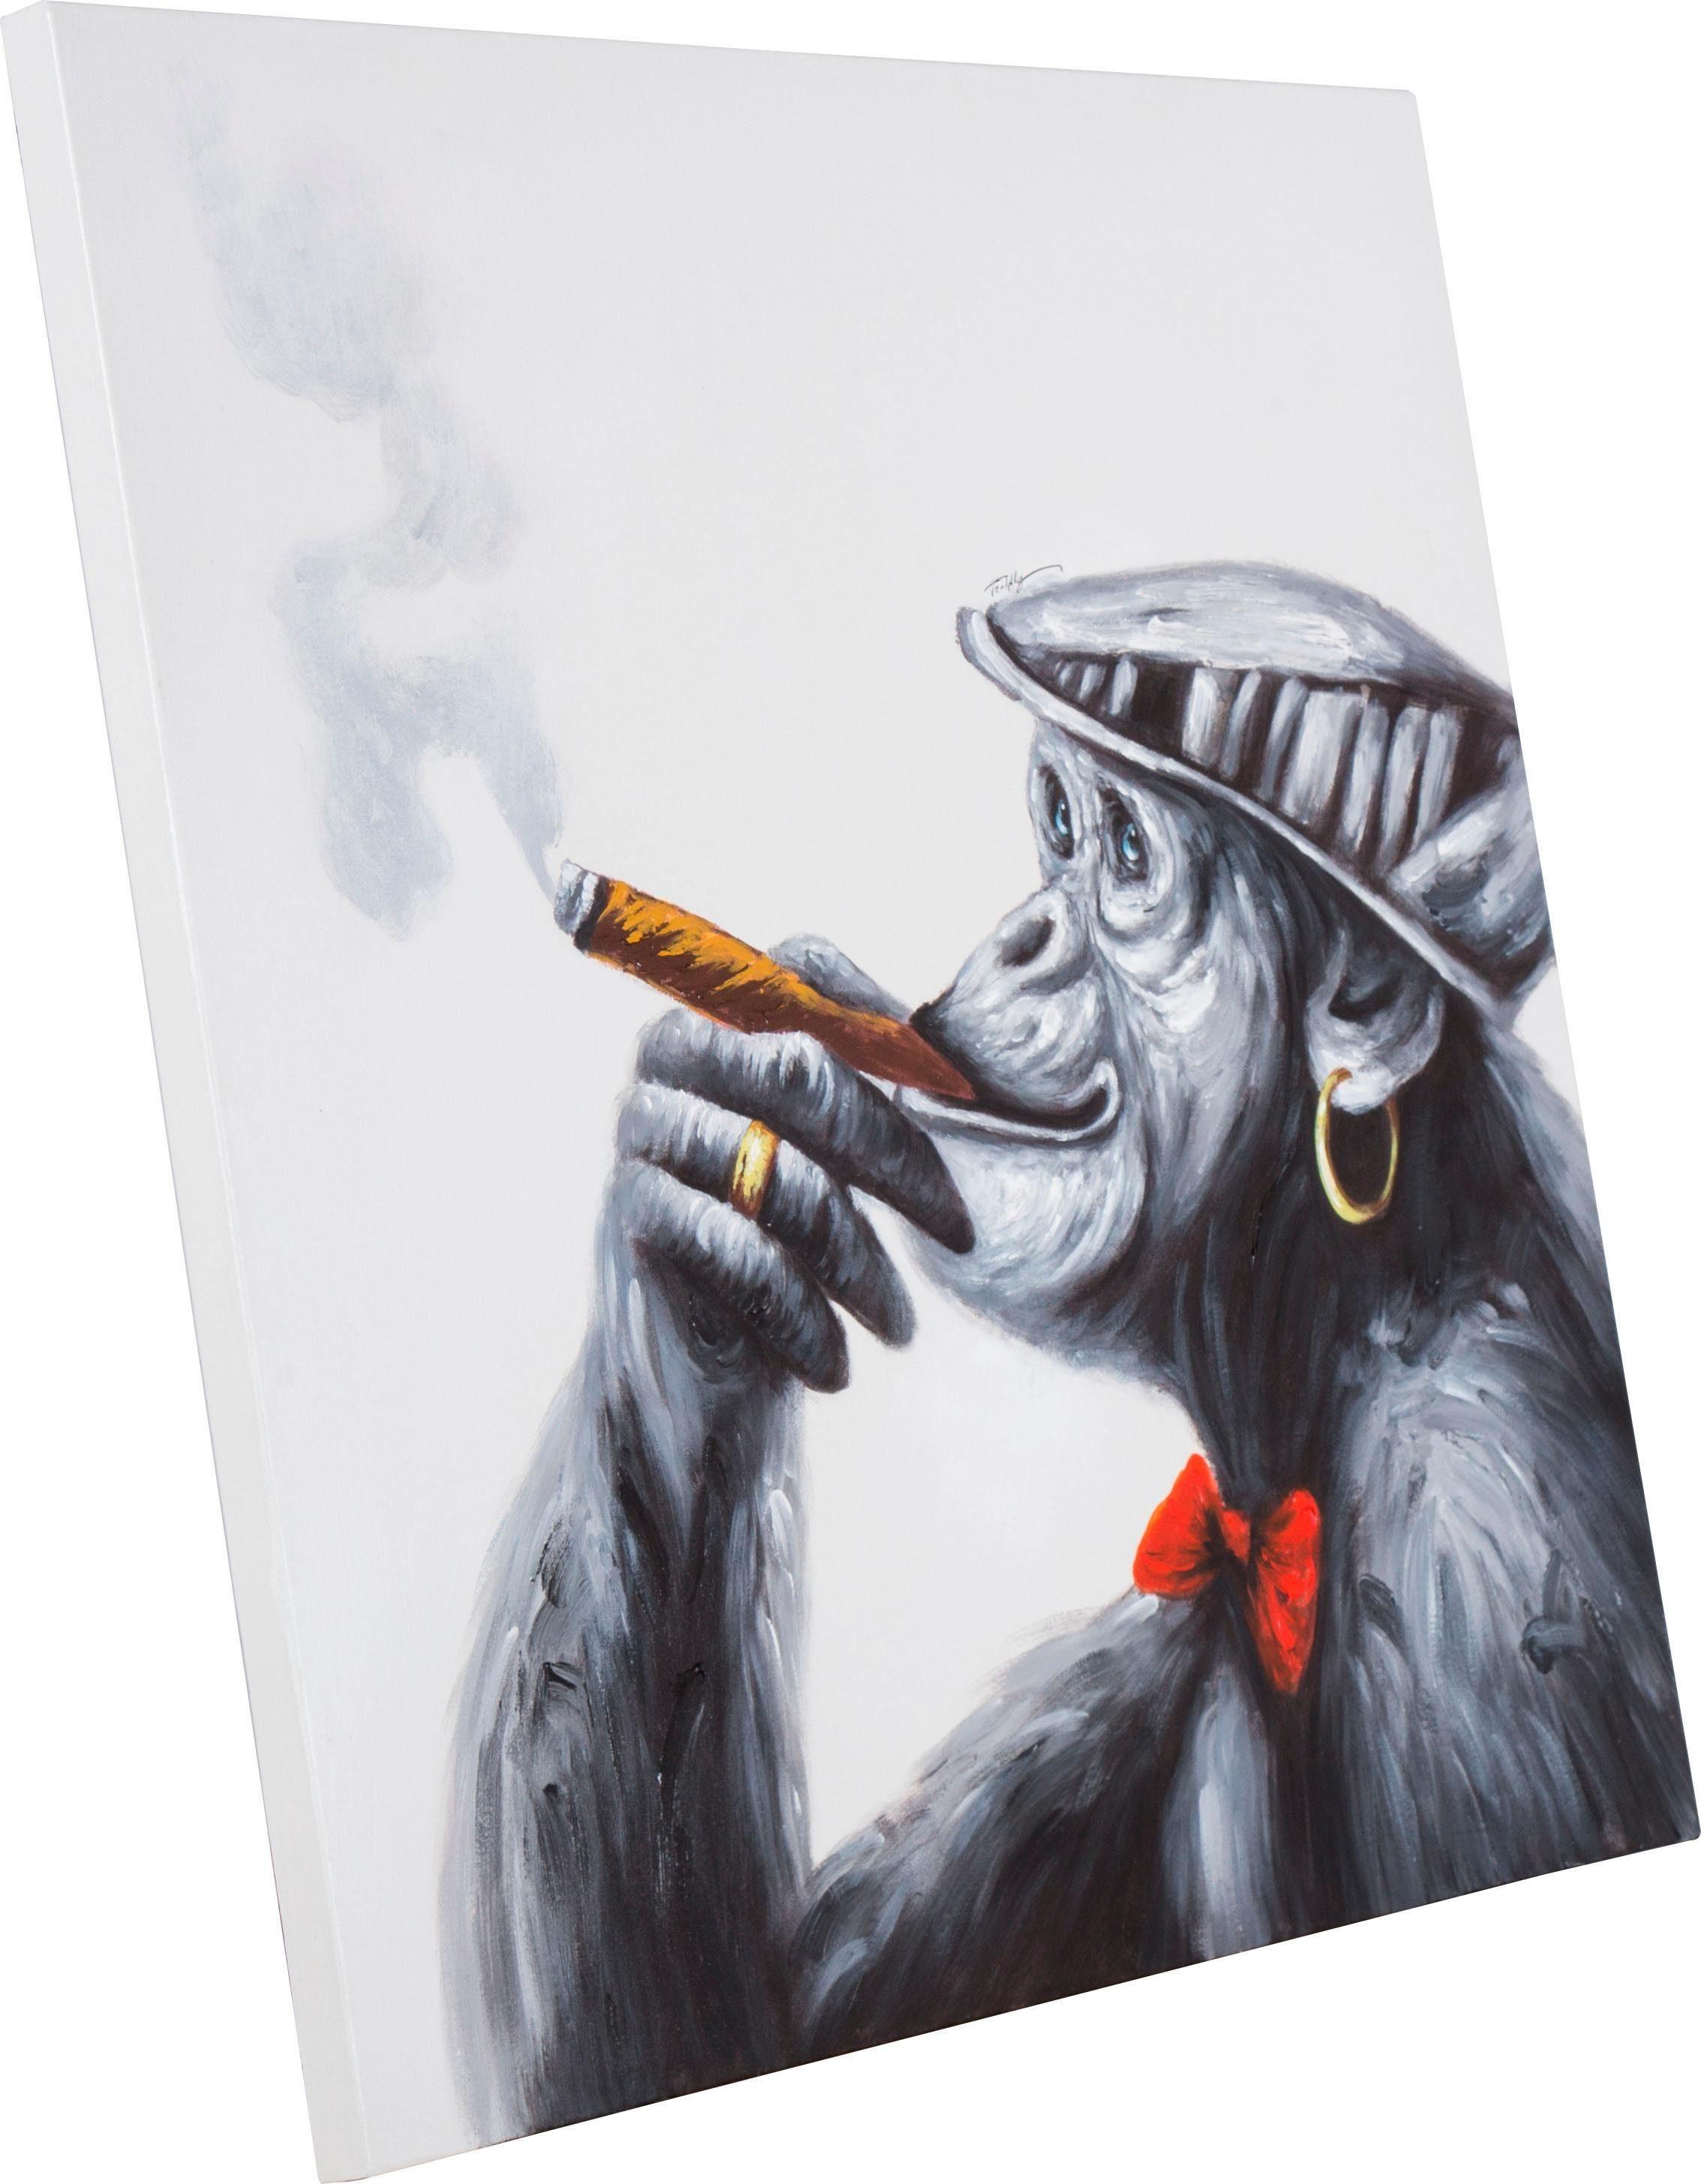 Ölgemälde »Rauchender Affe«, 100/100 cm, handgemalt